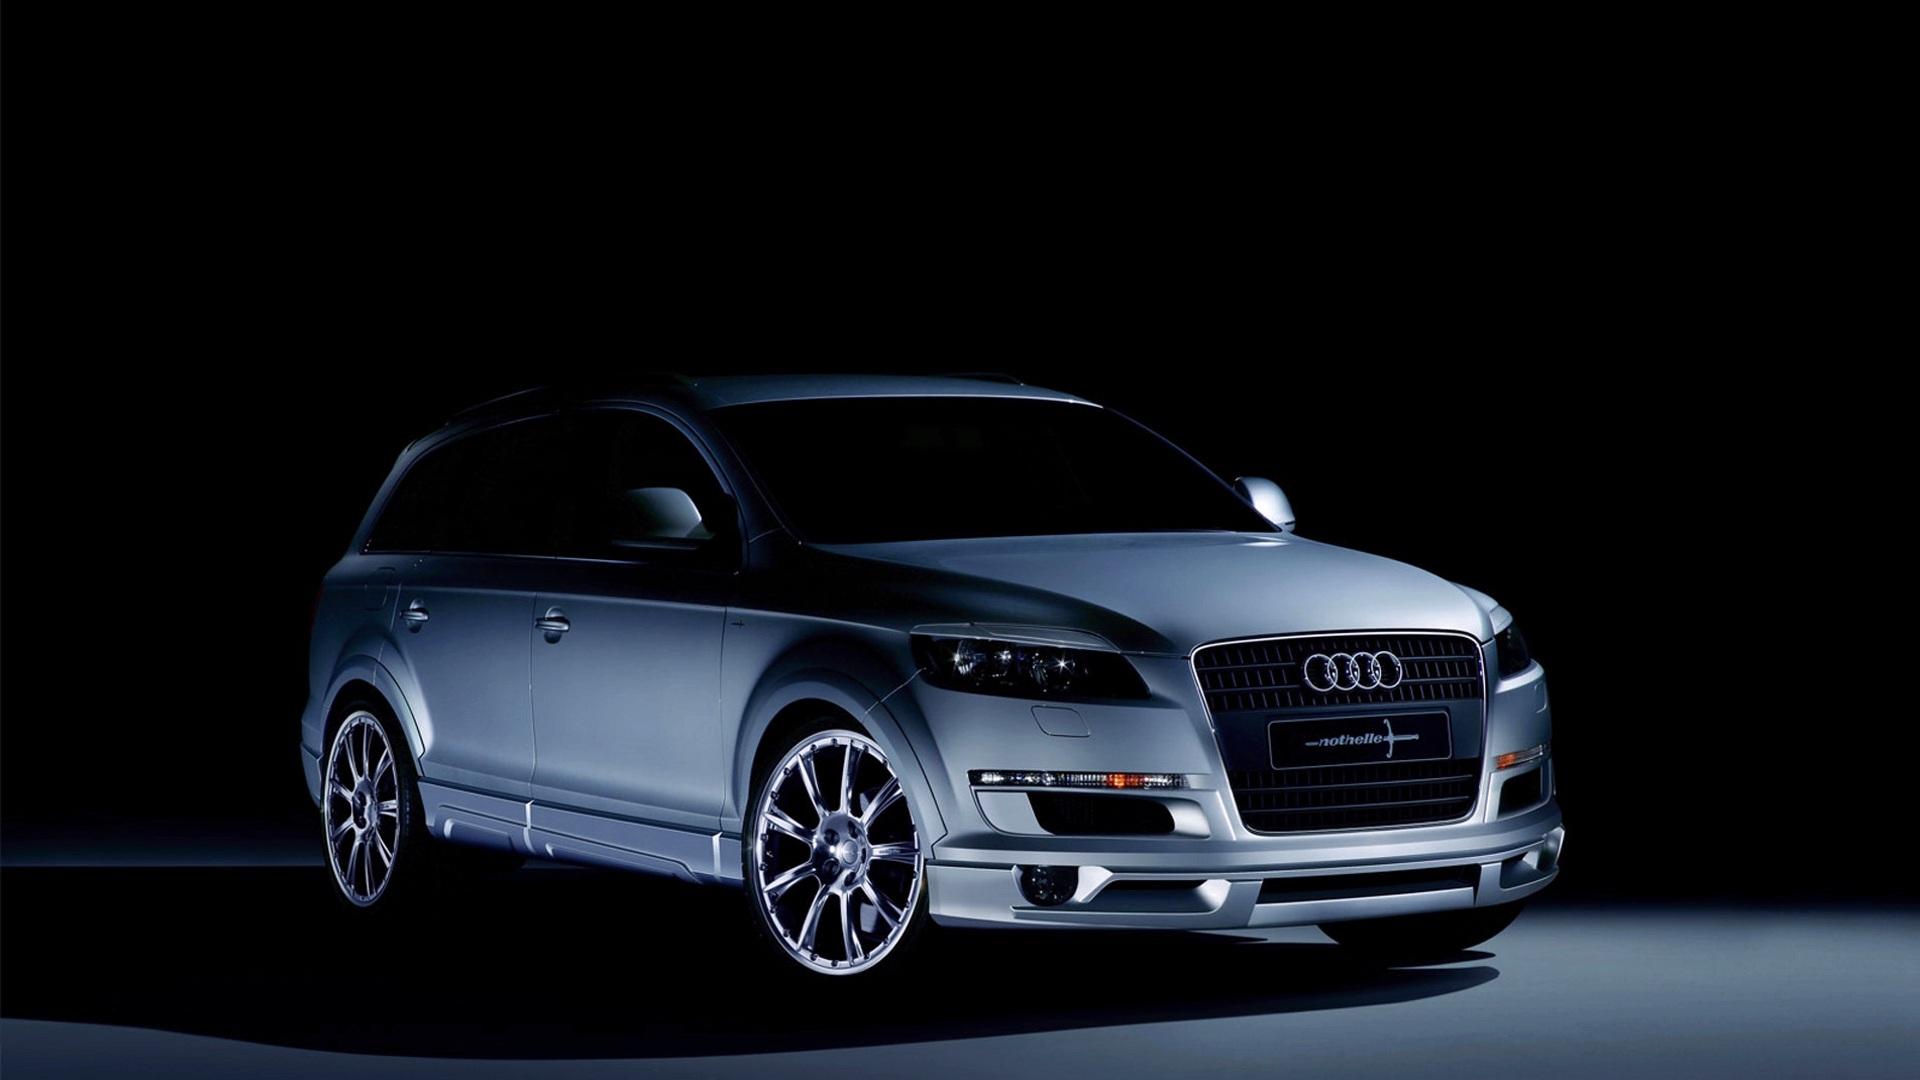 Audi Q7 в пустыне без смс